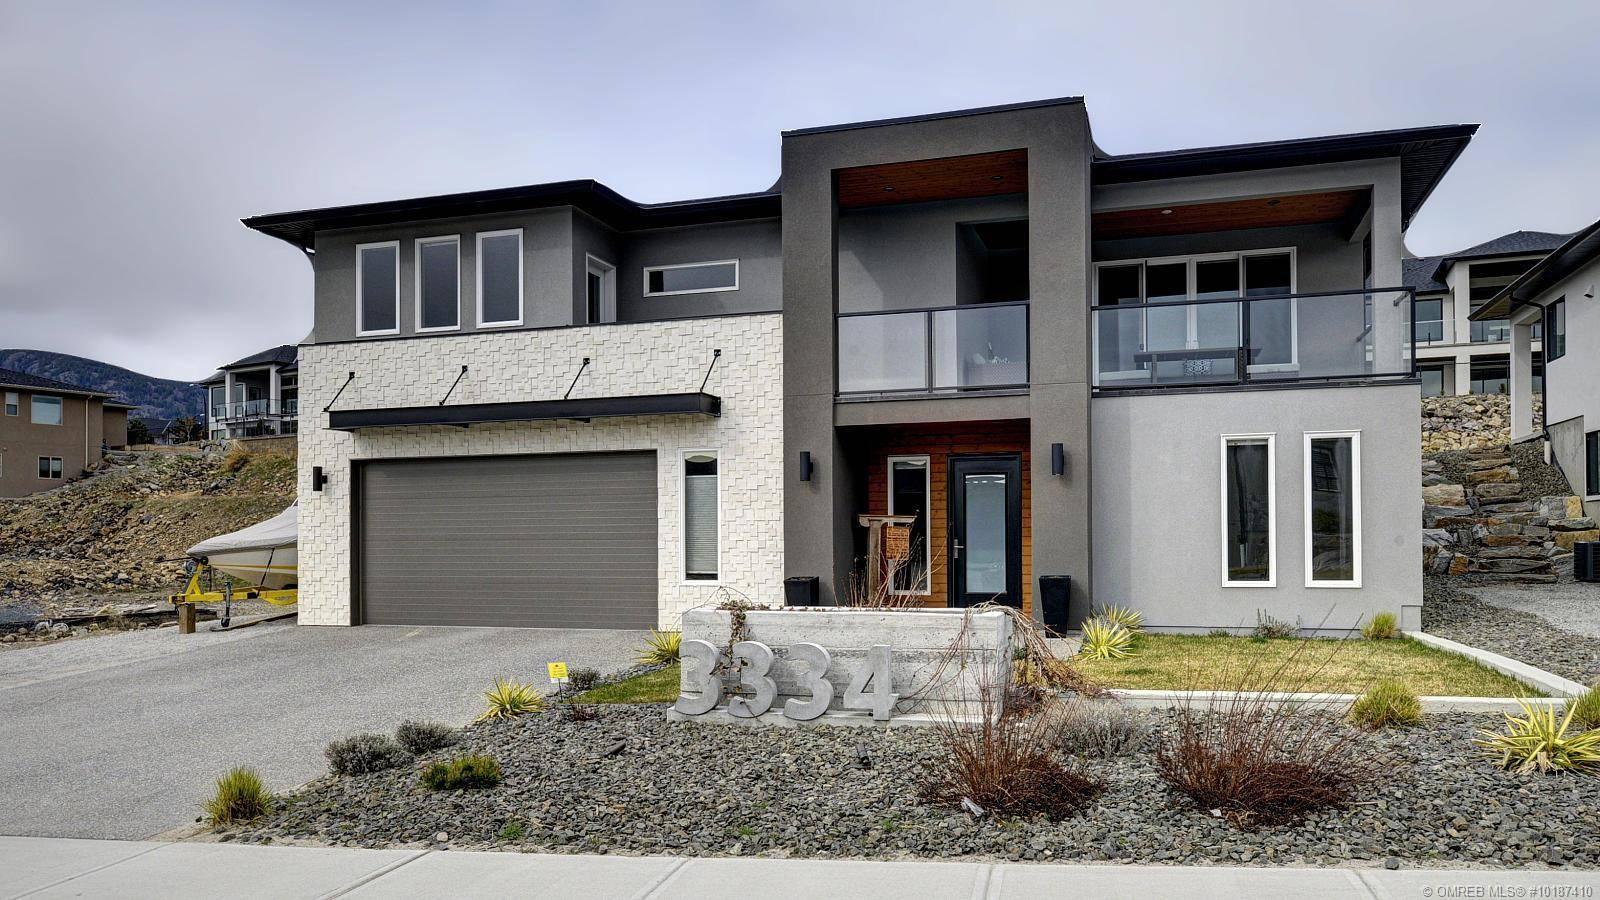 House for sale at 3334 Vineyard View Dr West Kelowna British Columbia - MLS: 10187410